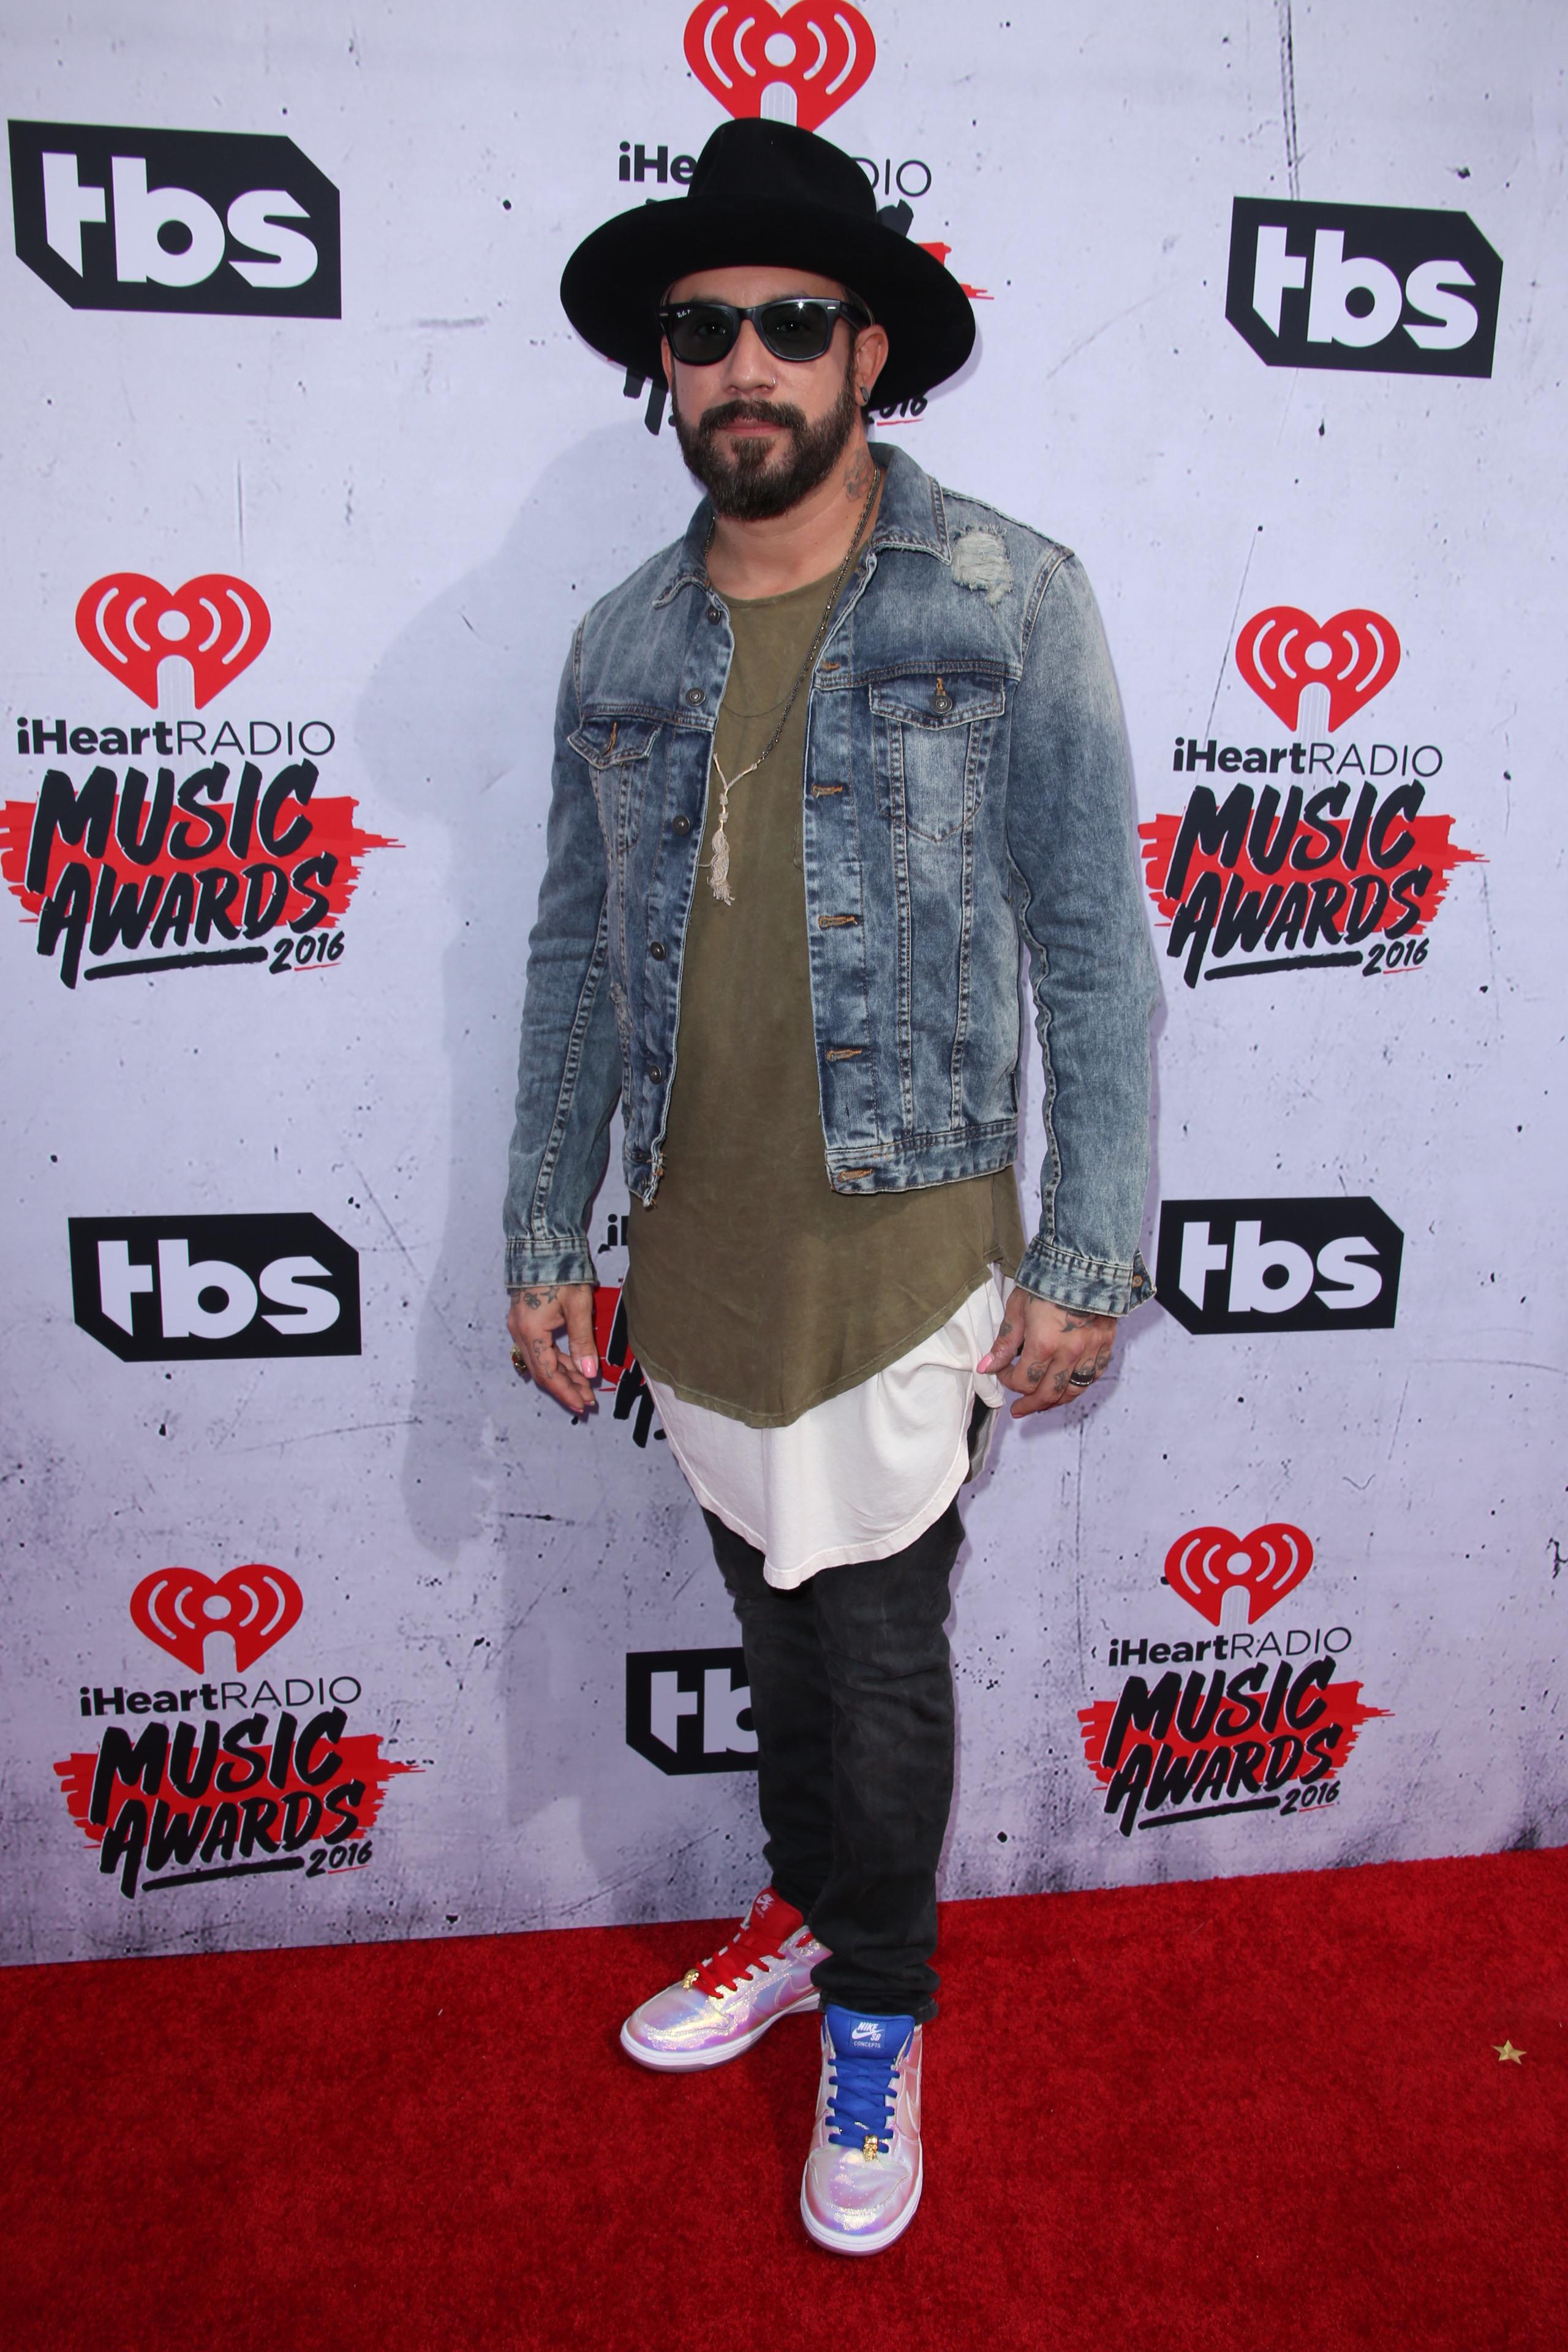 iHeartRadio Music Awards 2016 - what the stars wore